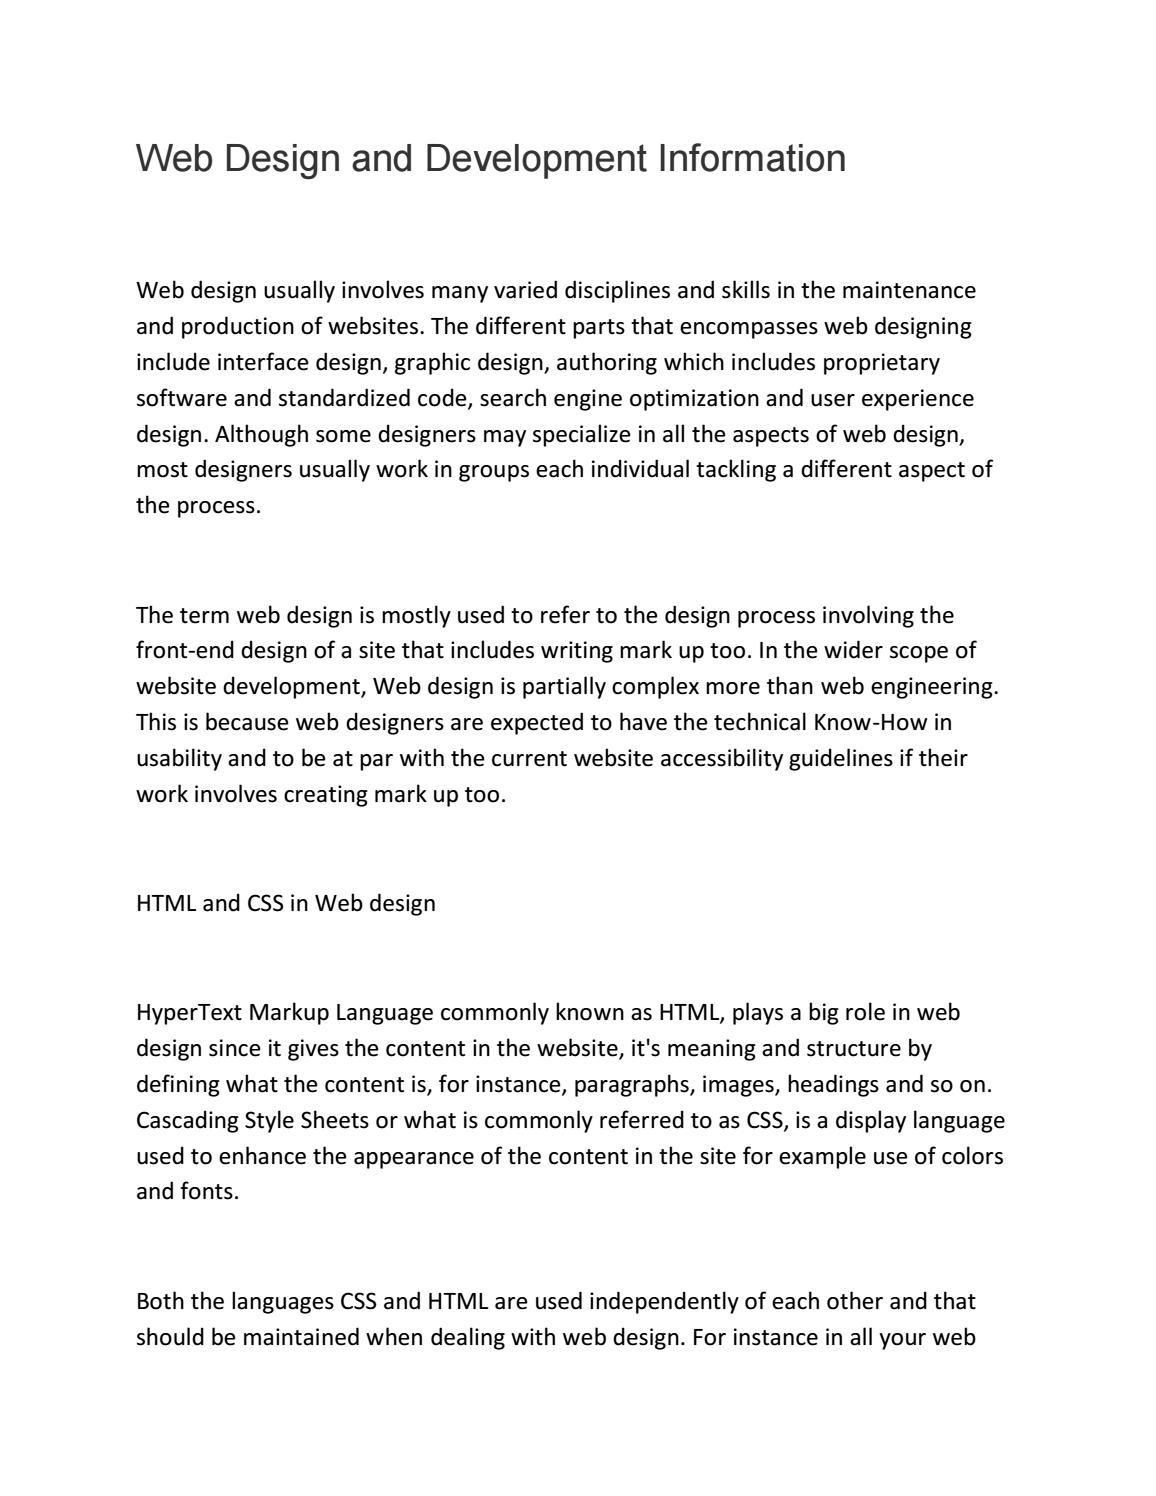 Web Design And Development Information By S4g2webdesign Issuu